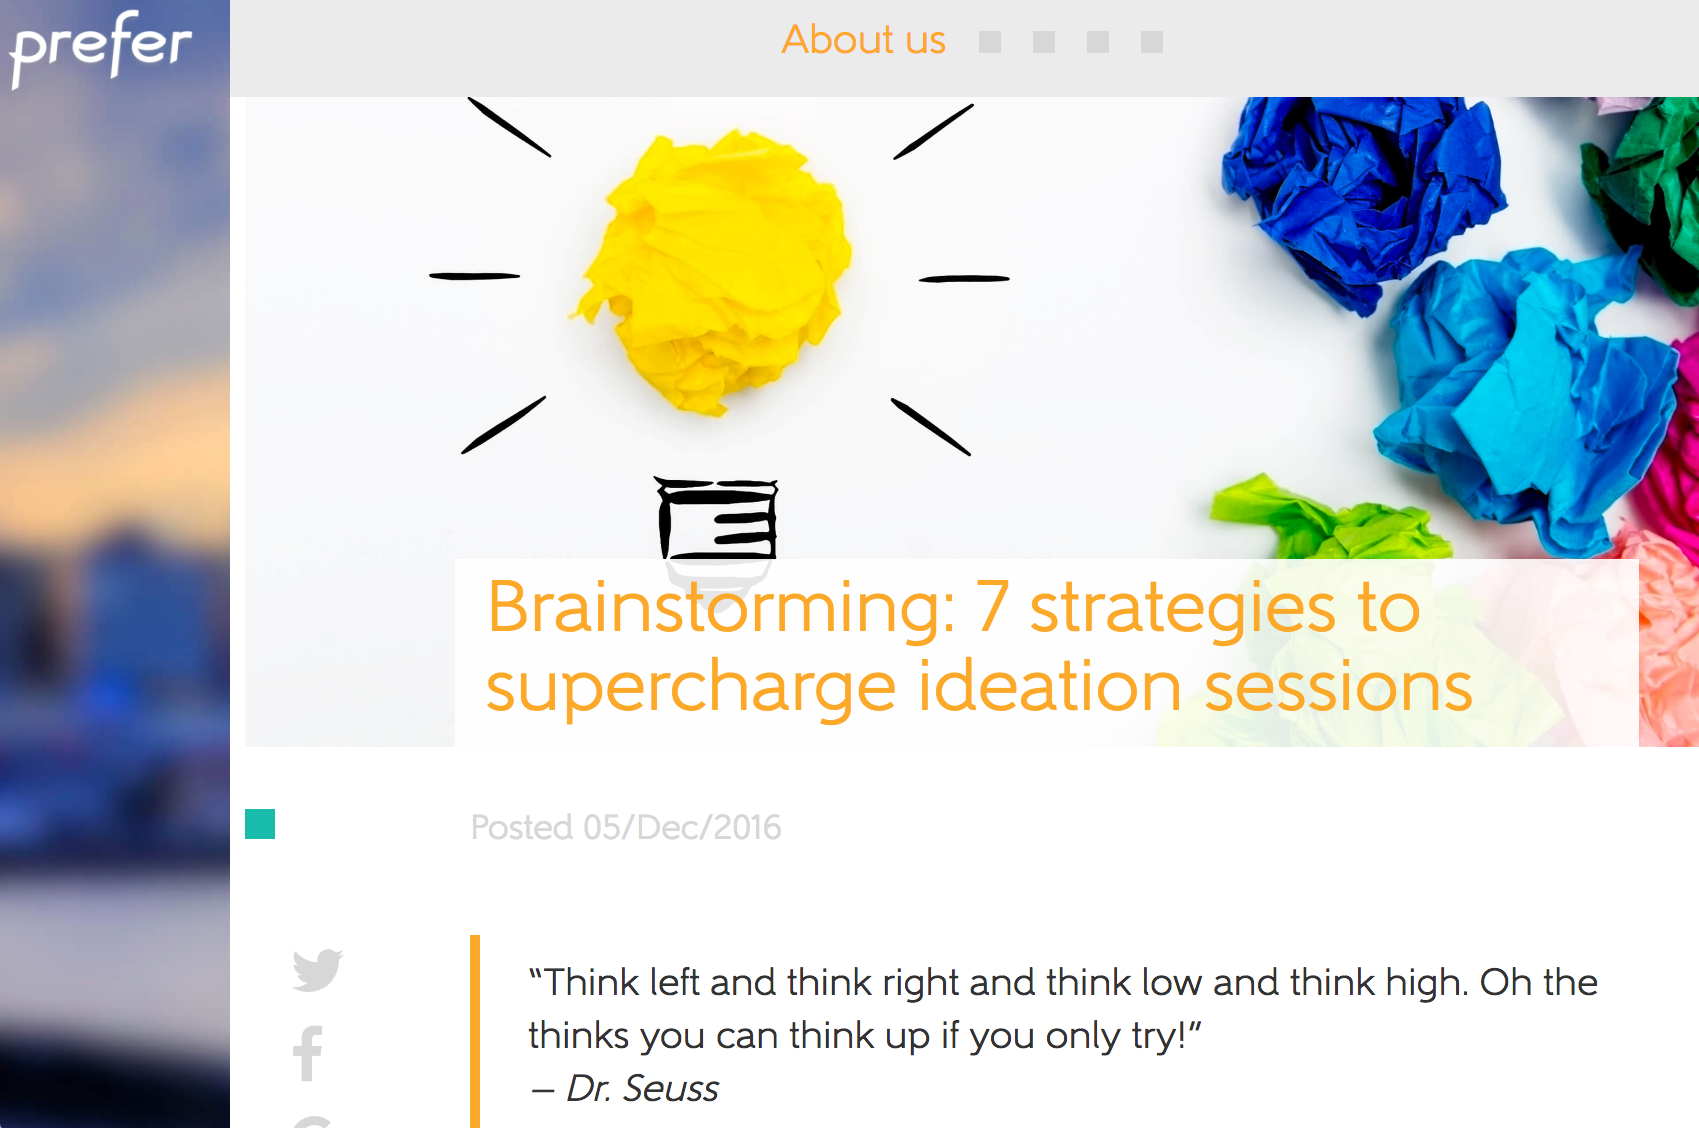 prefer brainstorming